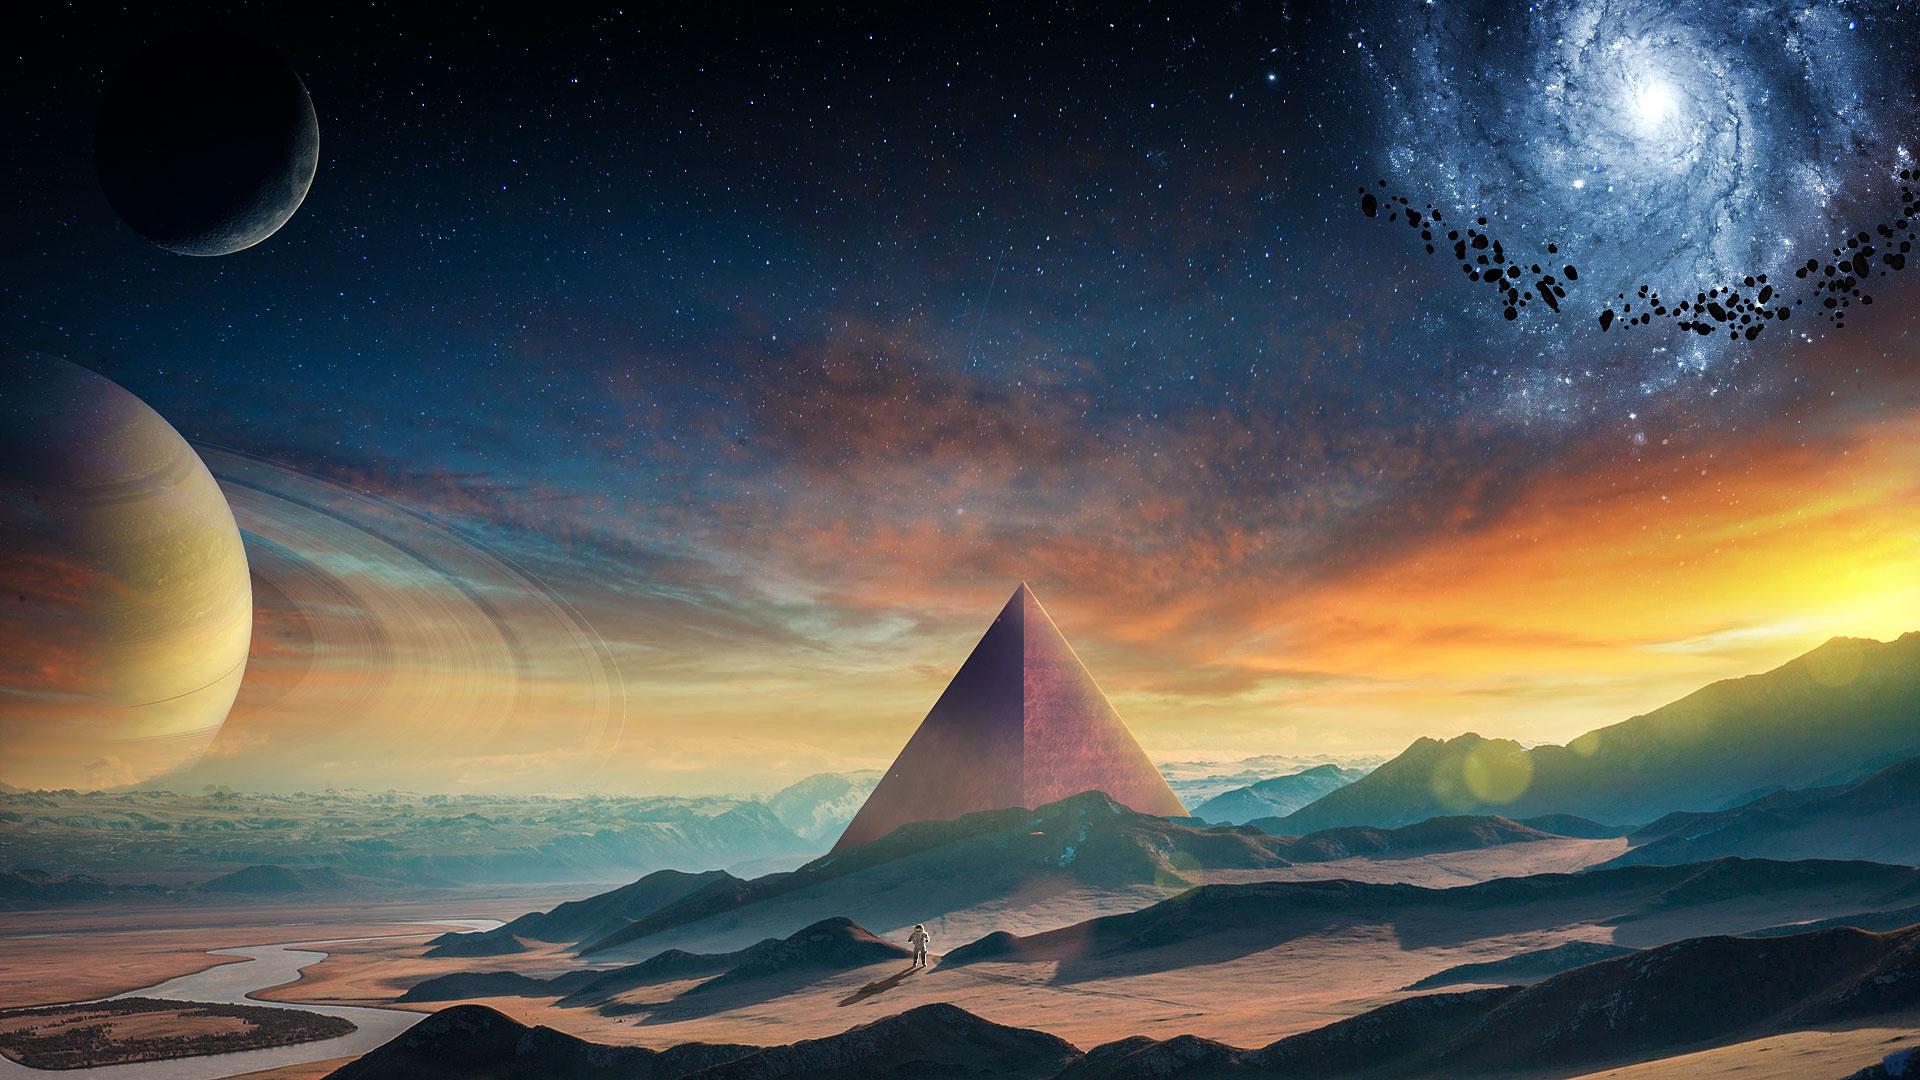 Download 1920x1080 wallpaper planet, fantasy, pyramids, space, landscape, full hd, hdtv, fhd ...